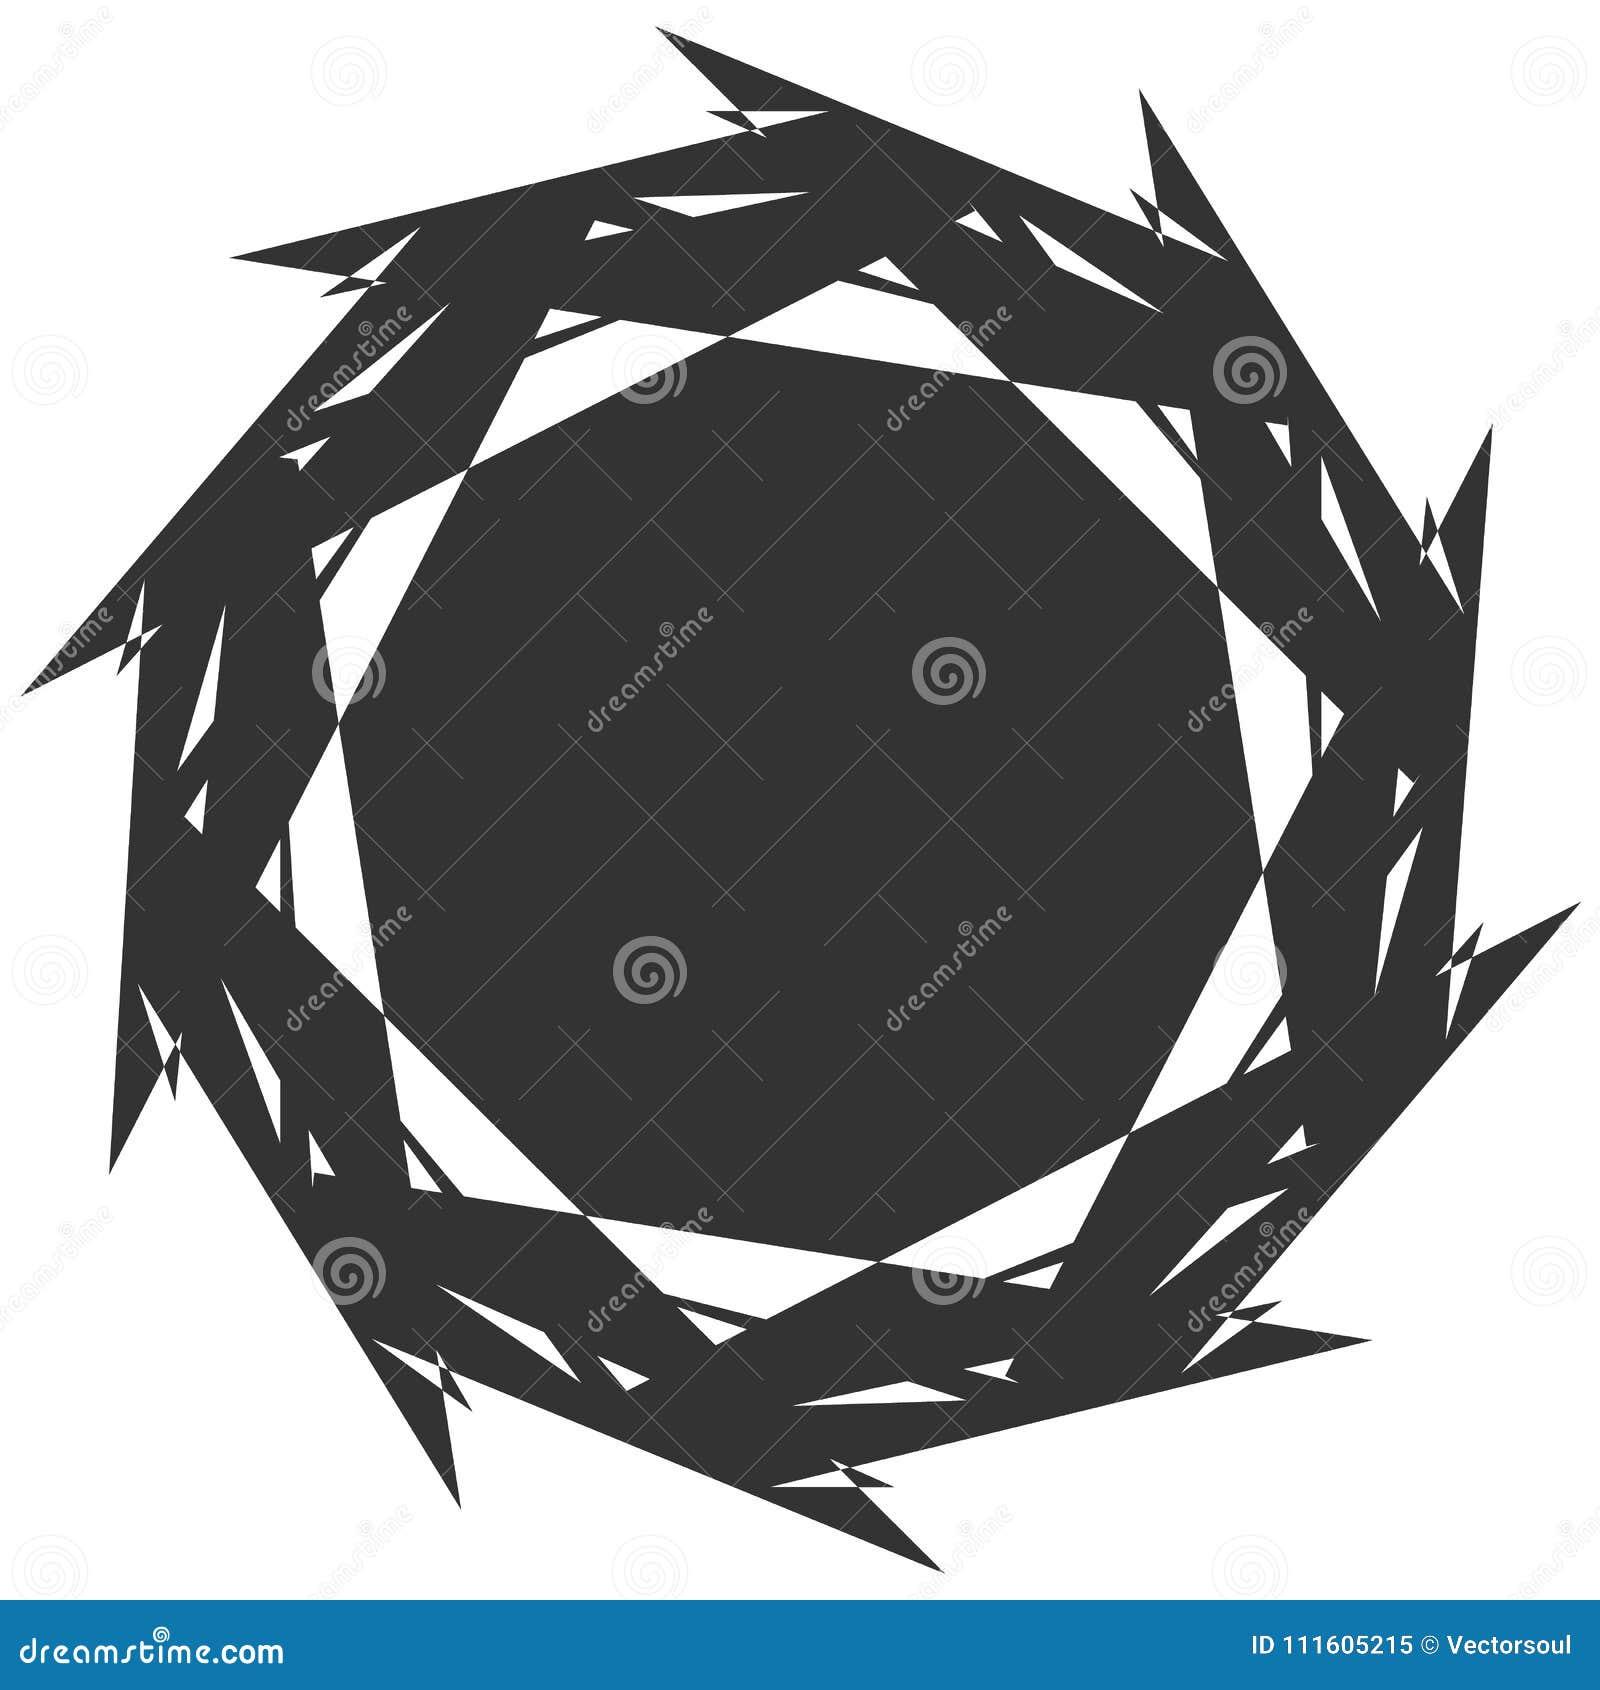 Circular, elemento abstracto radial en blanco Radiación de forma con